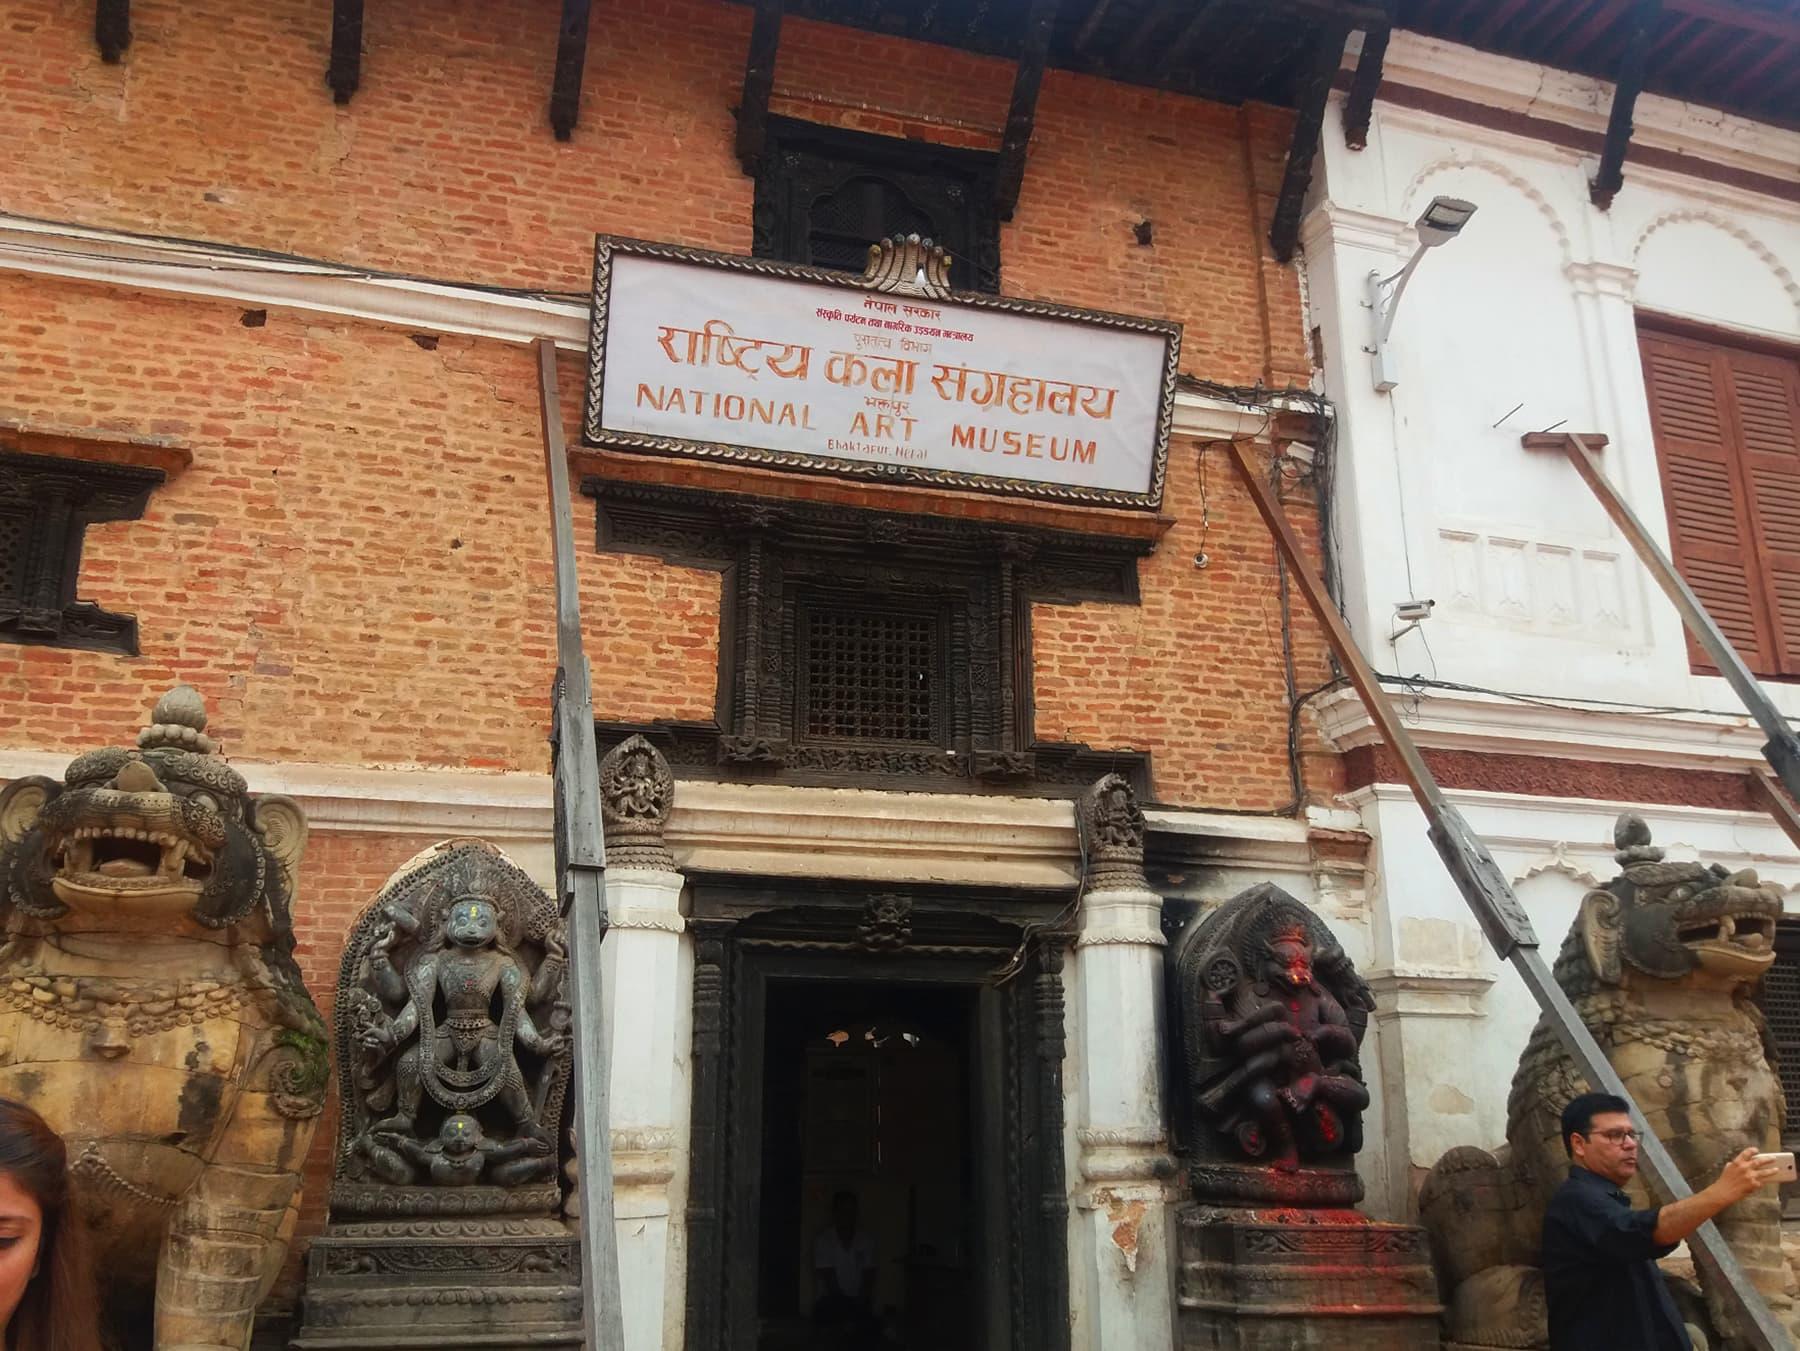 نیشنل آرٹ میوزیم نیپال—تصویر شبینہ فراز